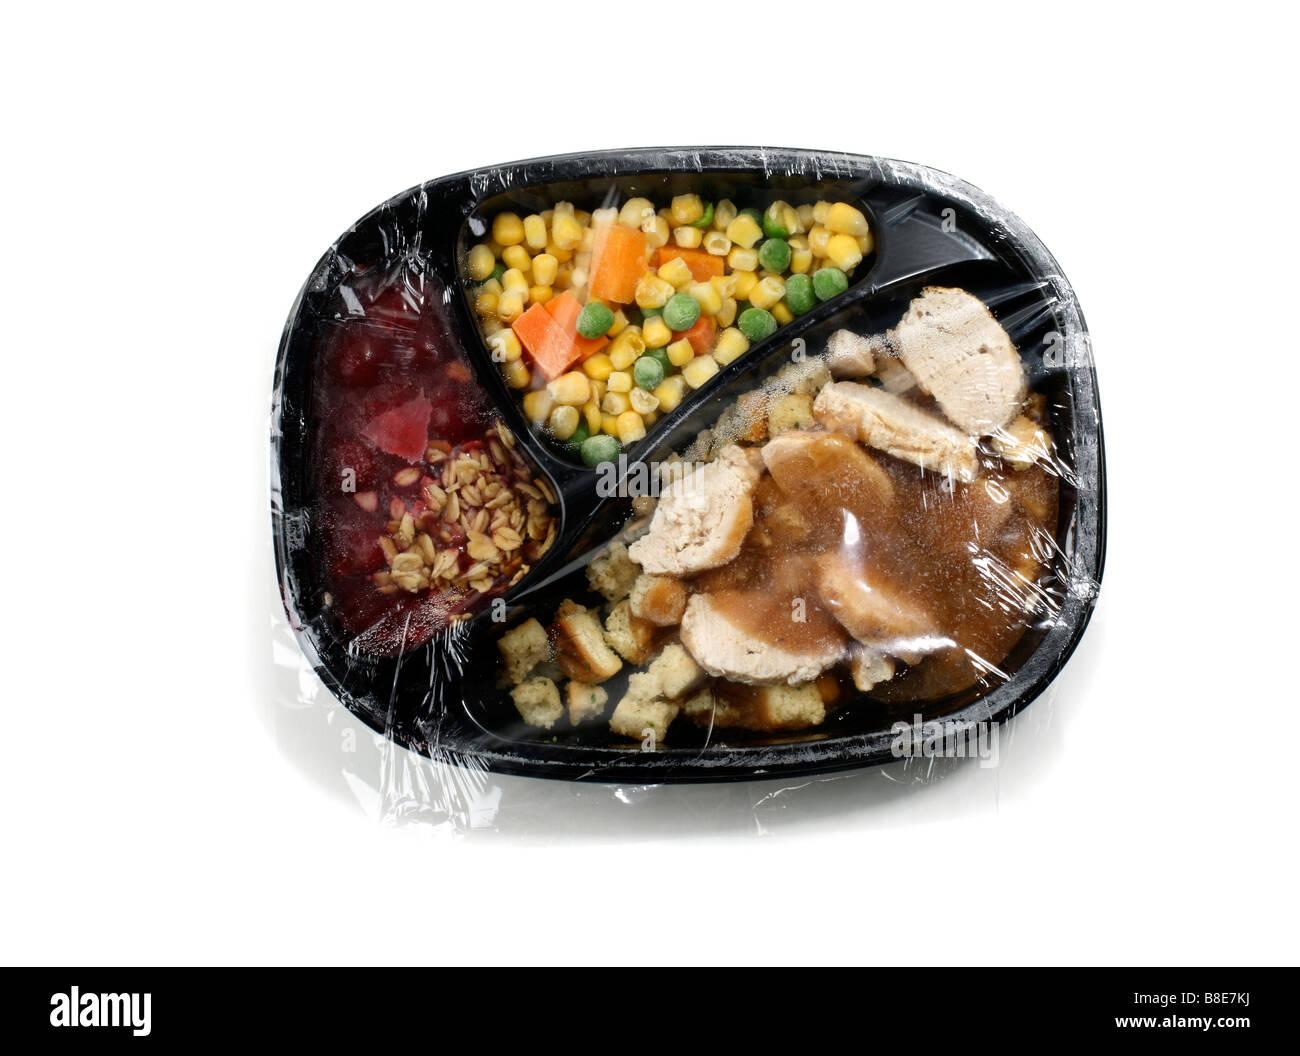 Wrapped Frozen turkey Dinner - Stock Image